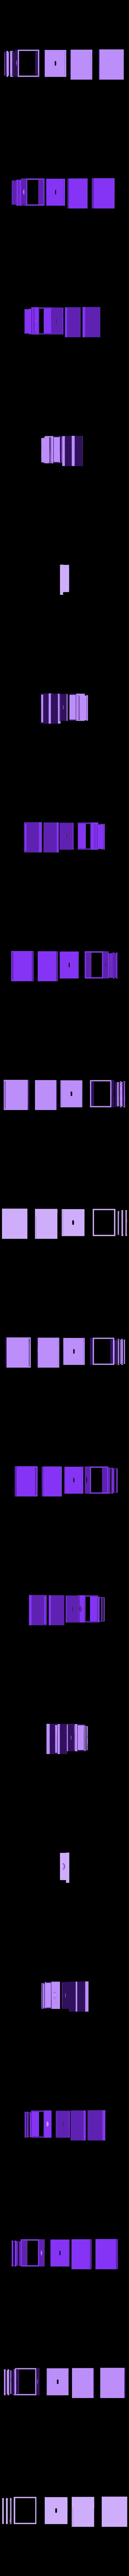 Medium_Lang_All_Components.obj Download free OBJ file Langstroth Beehive Model • Object to 3D print, AlbertKhan3D